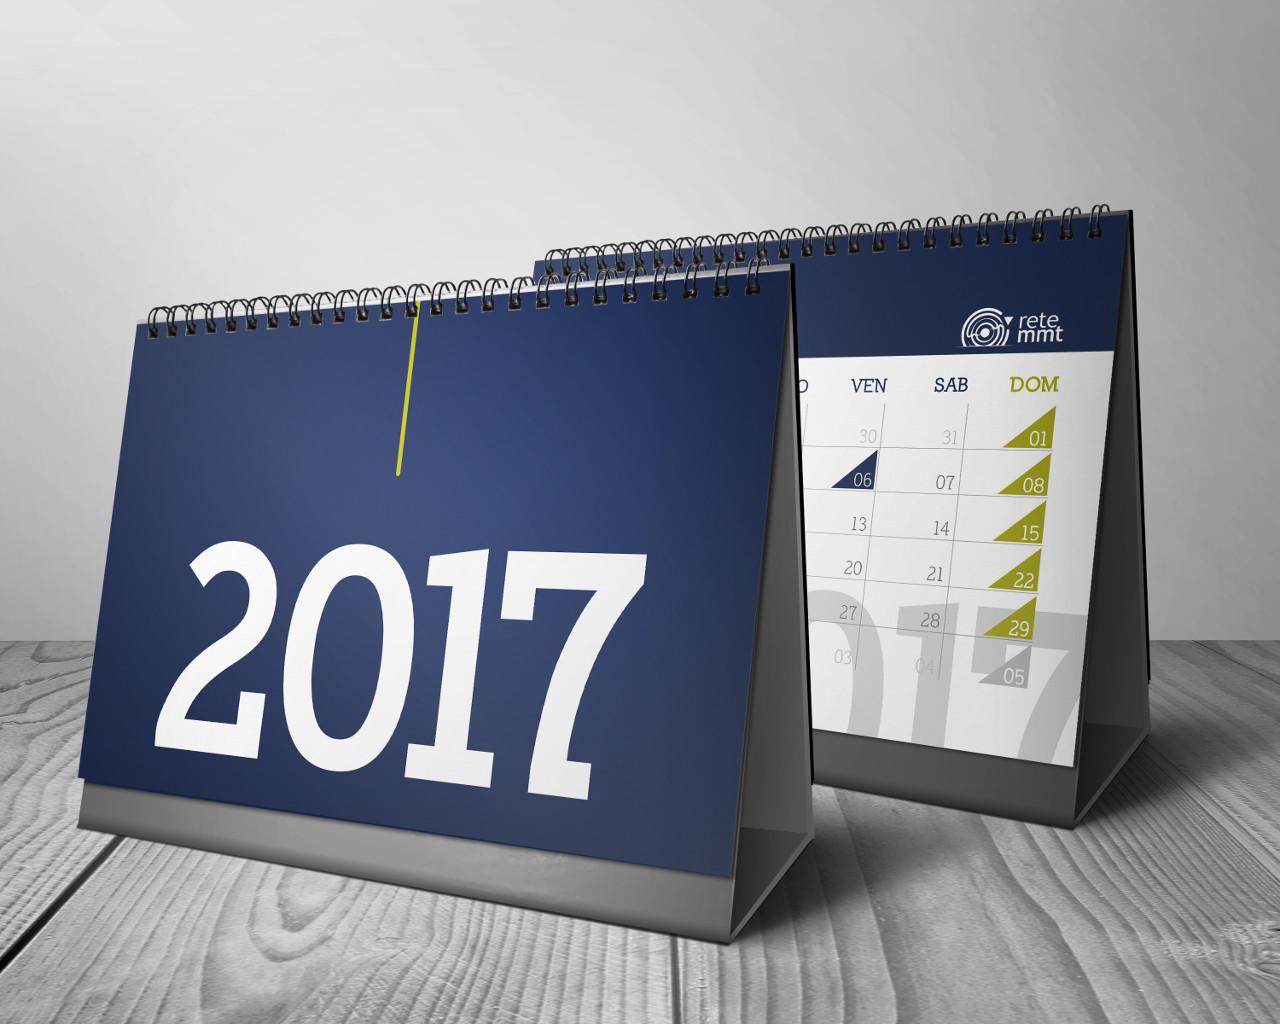 Stampa calendari online da tavolo tipografia pressart